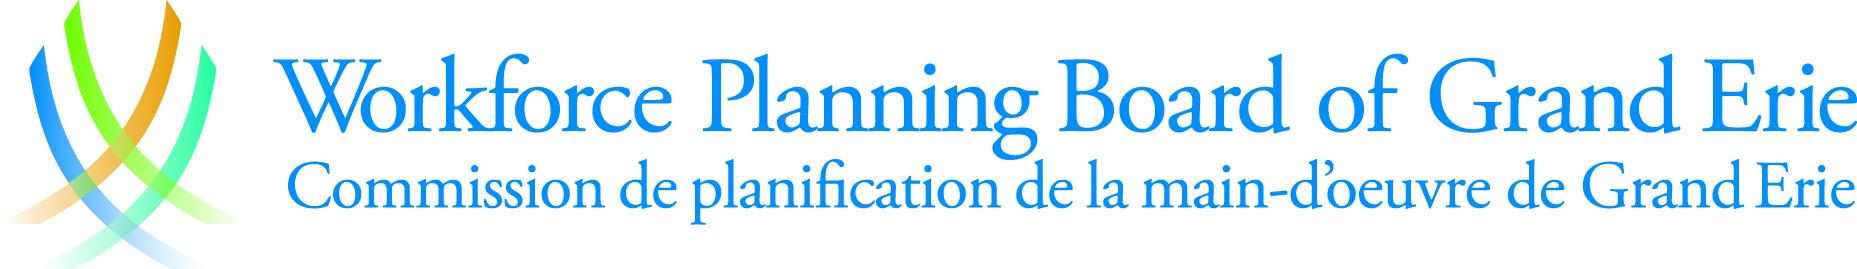 Workforce Planning Board of Grand Erie Logo